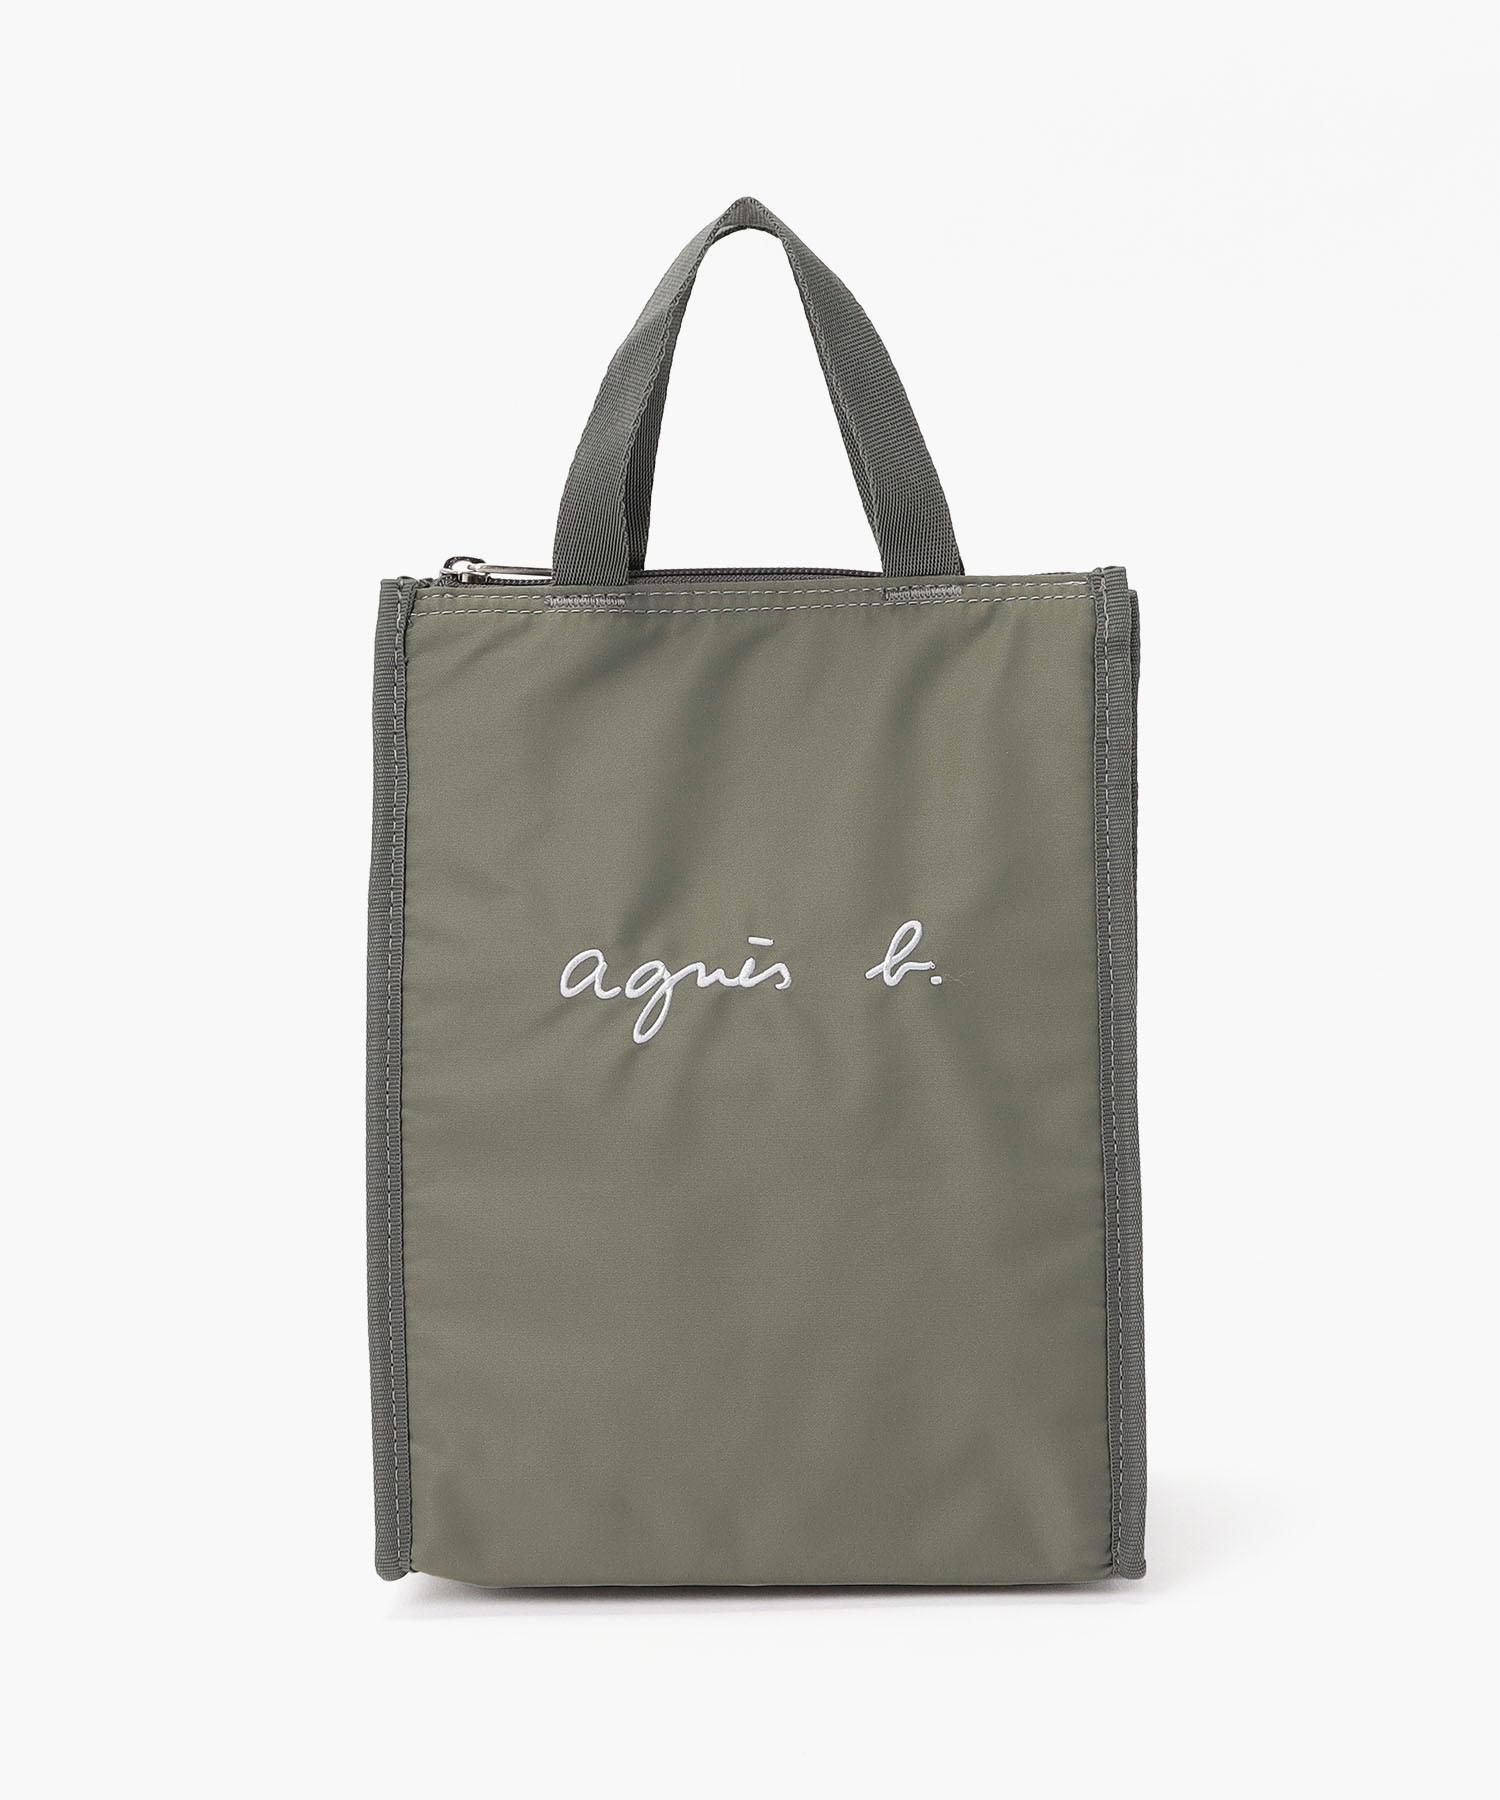 GL11 E LUNCH BAG ロゴ刺繍 保冷ランチバッグ